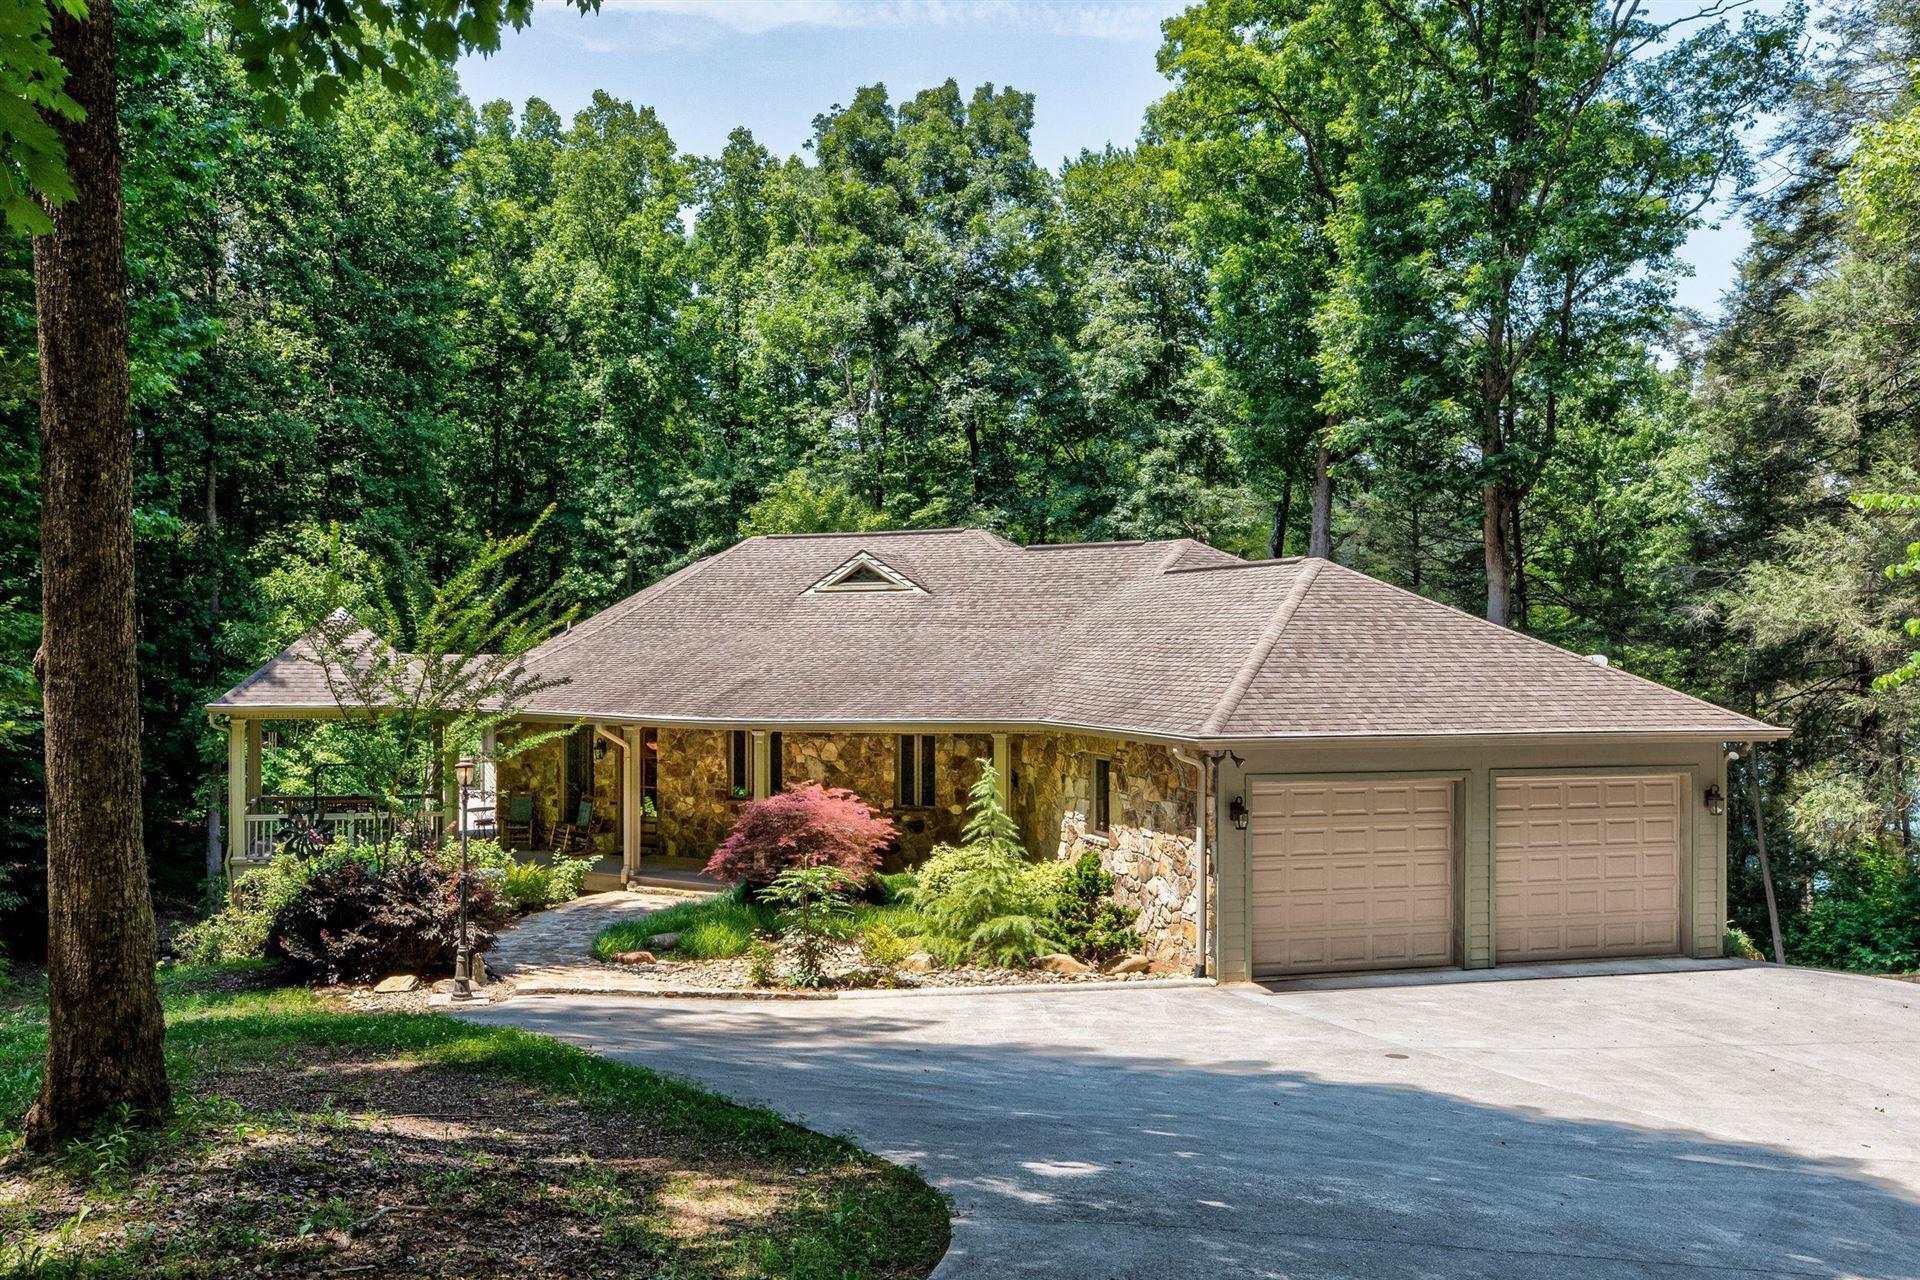 145 Hemlock Bluff Lane, Caryville, TN 37714 - MLS#: 1157383